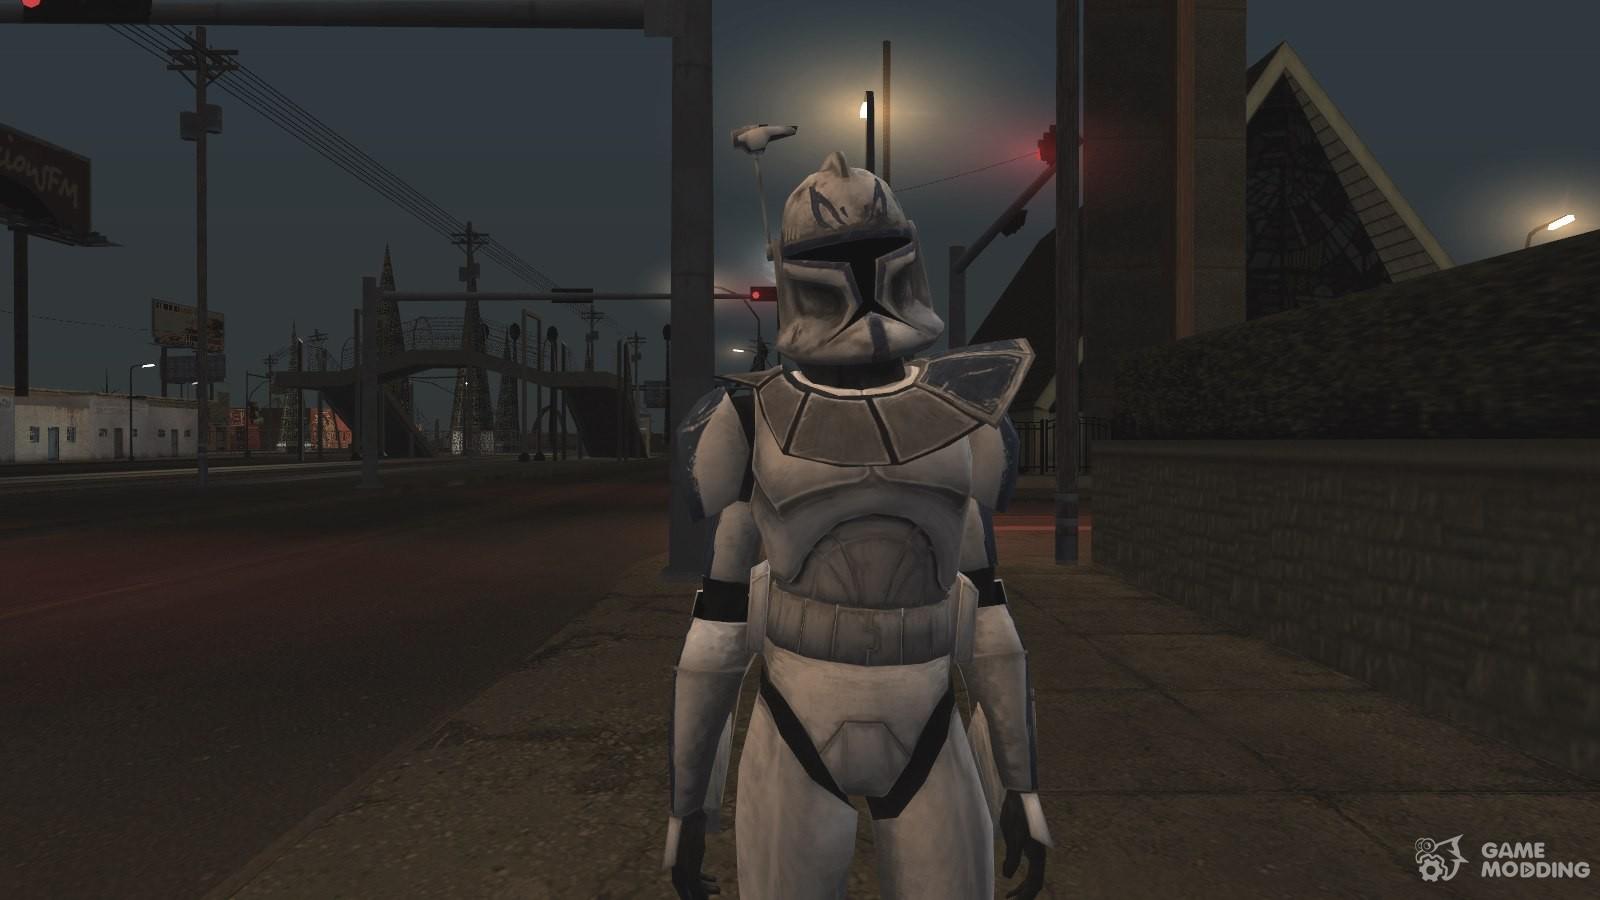 Kapitan Rex From Star Wars Clone Wars For Gta San Andreas Fallout 4 Clones Mods 1600x900 Wallpaper Teahub Io